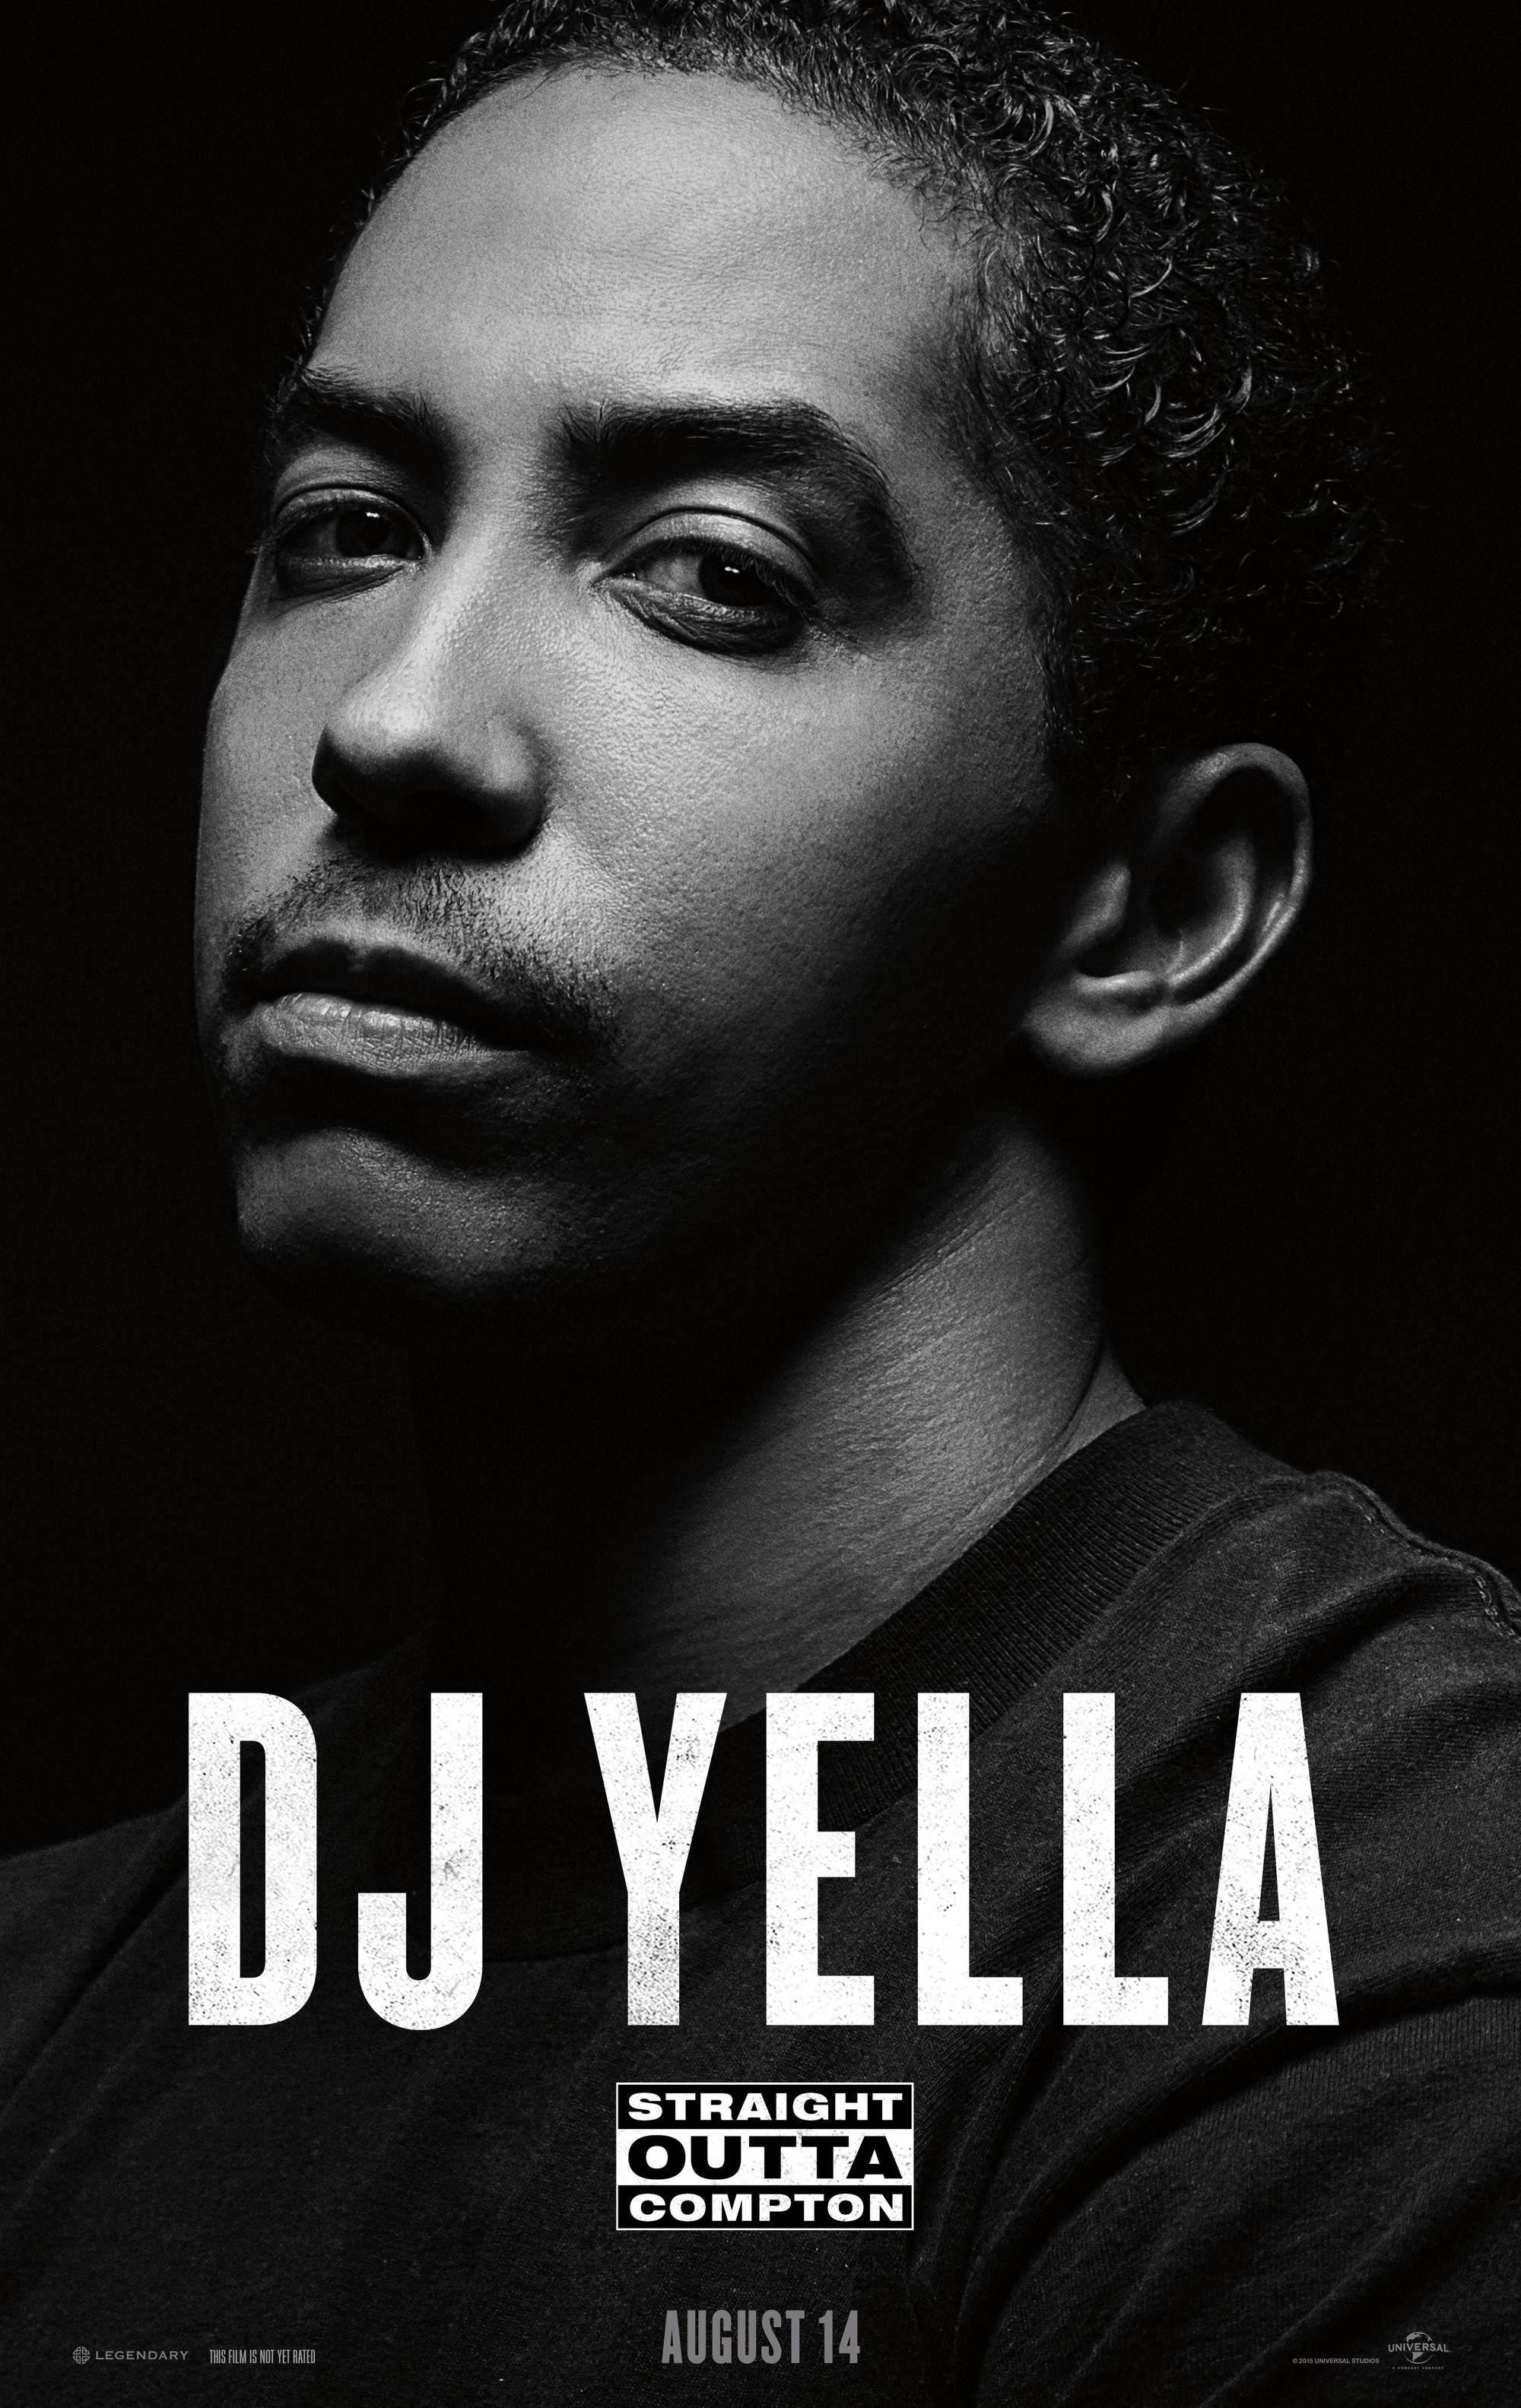 STRAIGHT OUTTA COMPTON rap rapper hip hop gangsta nwa biography drama music  1soc poster wallpaper | | 789272 | WallpaperUP